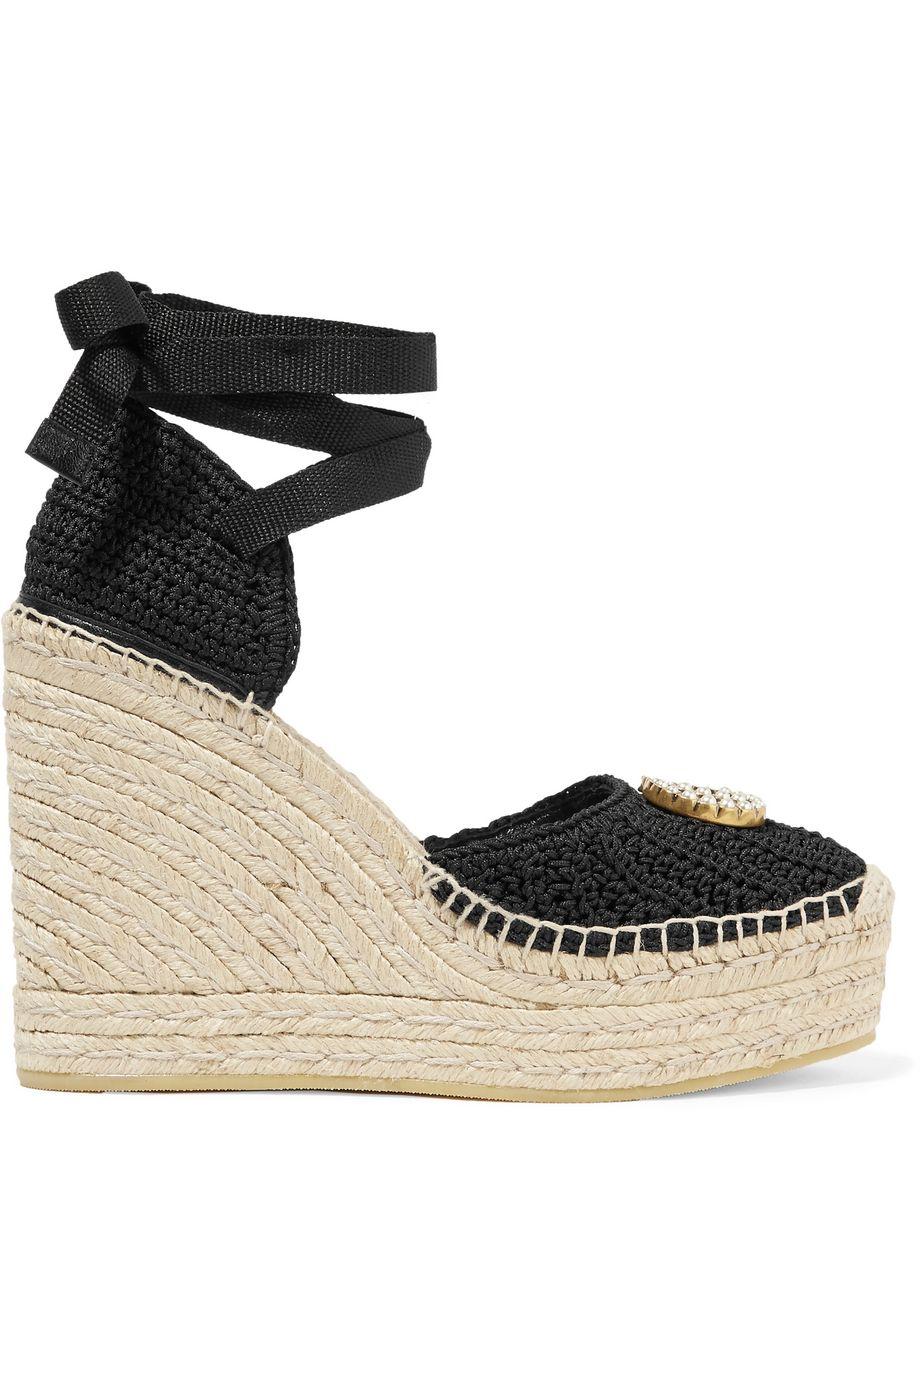 Gucci Lilibeth logo-embellished crocheted cotton wedge espadrilles